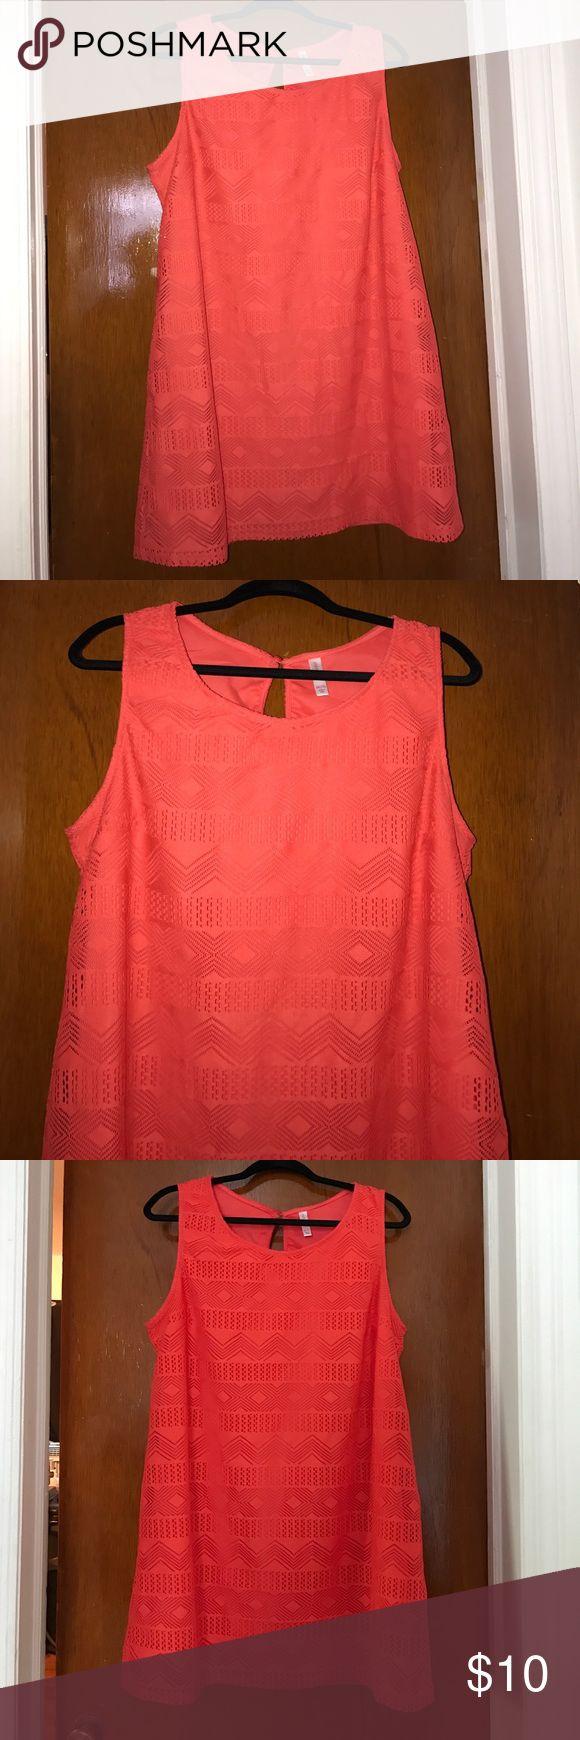 Xhilaration bright orange sleeves dress. SUPER CUTE XXL Plus Size Xhilaration (Target Brand) bright orange sleeves dress. Length is above the knee.  Fits Plus size 16.  NEW WITHOUT TAG, NEVER WORN Xhilaration Dresses Midi